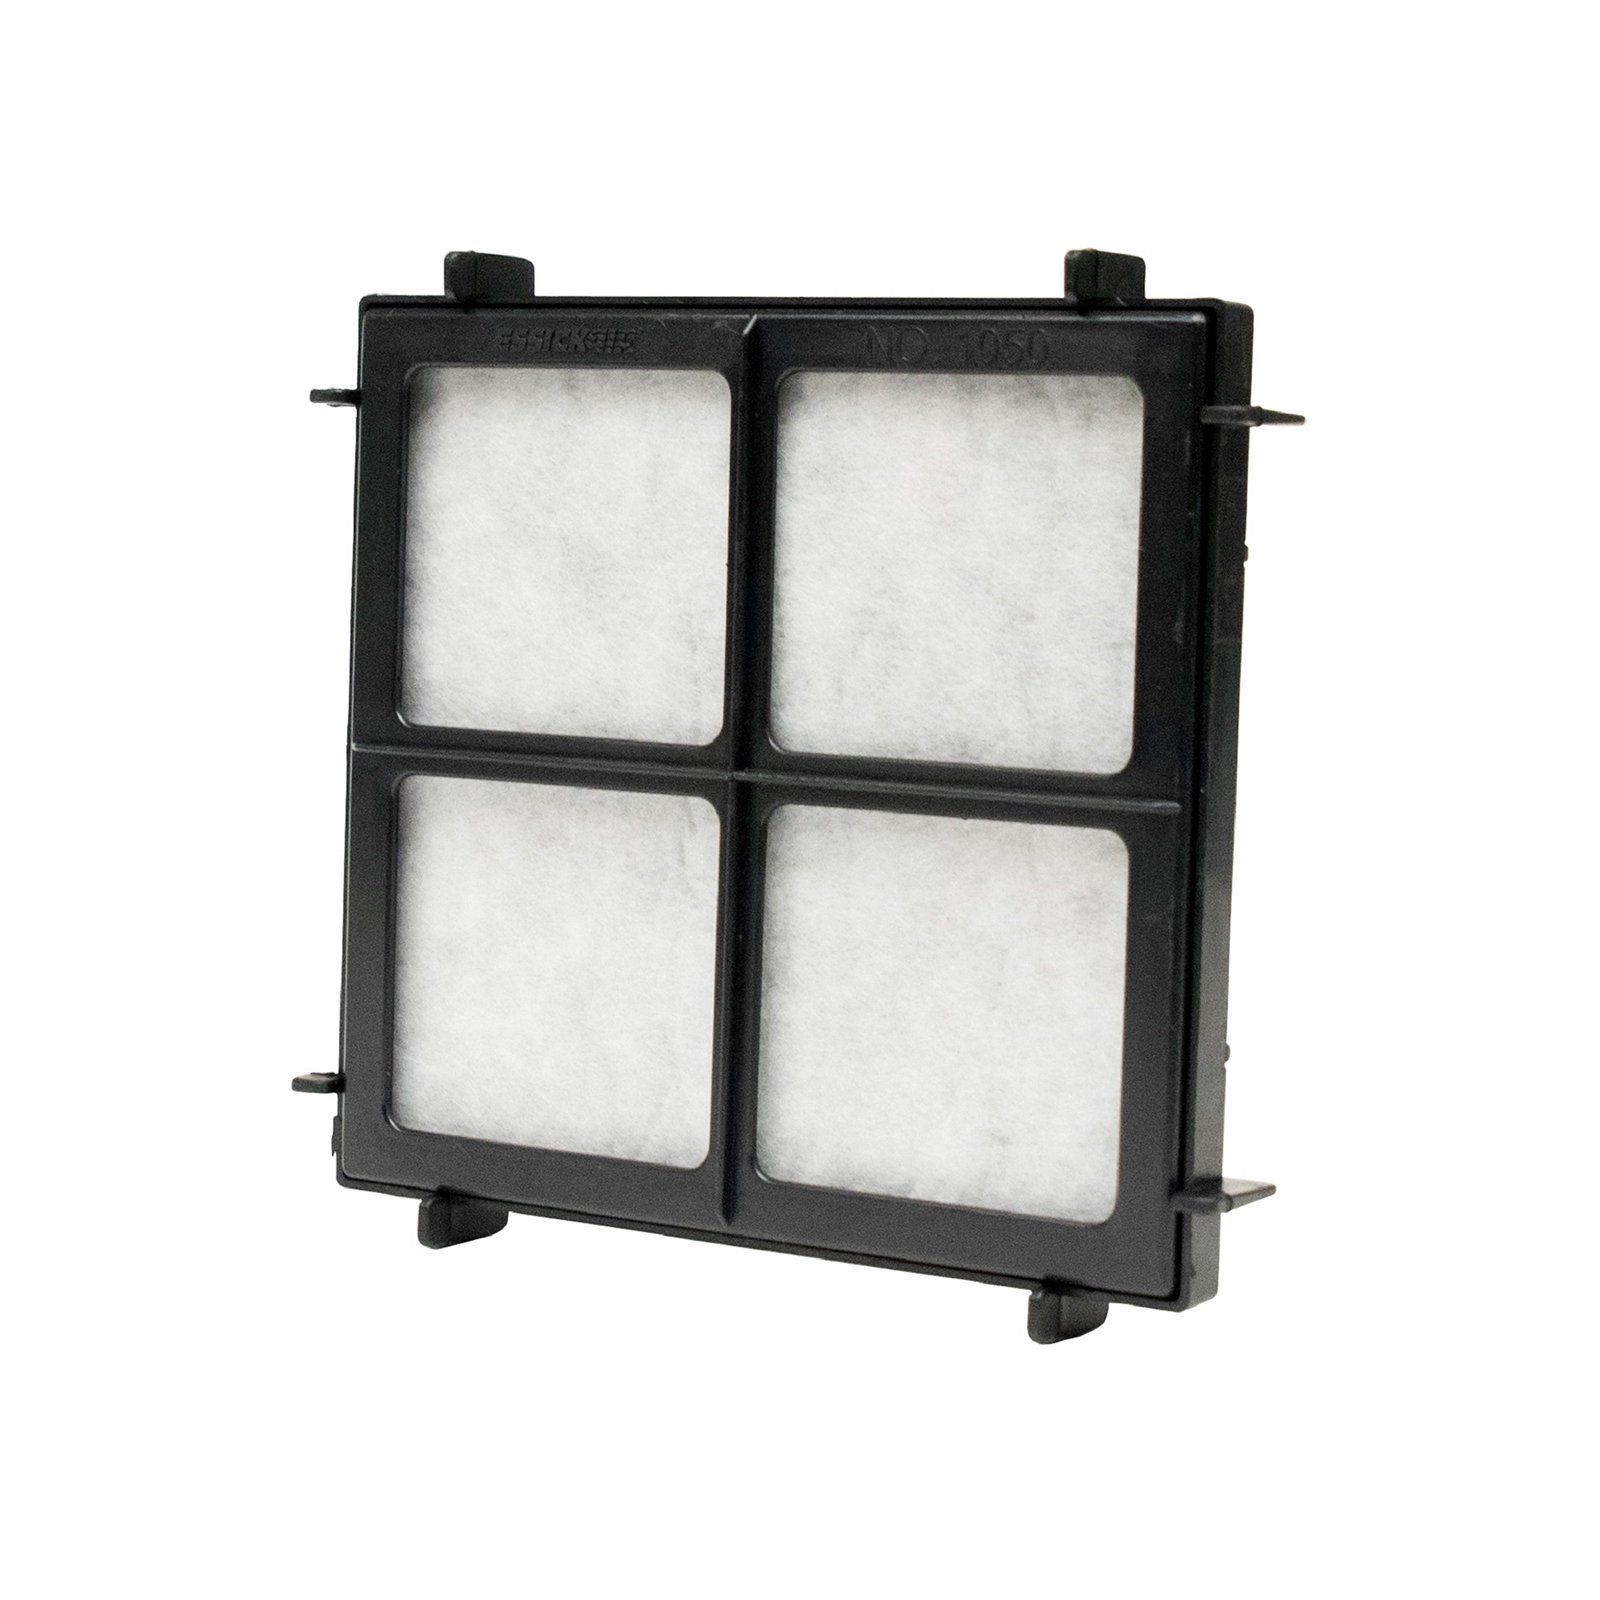 AIRCARE 1050 Air Filter 7V1050 Humidifier filters